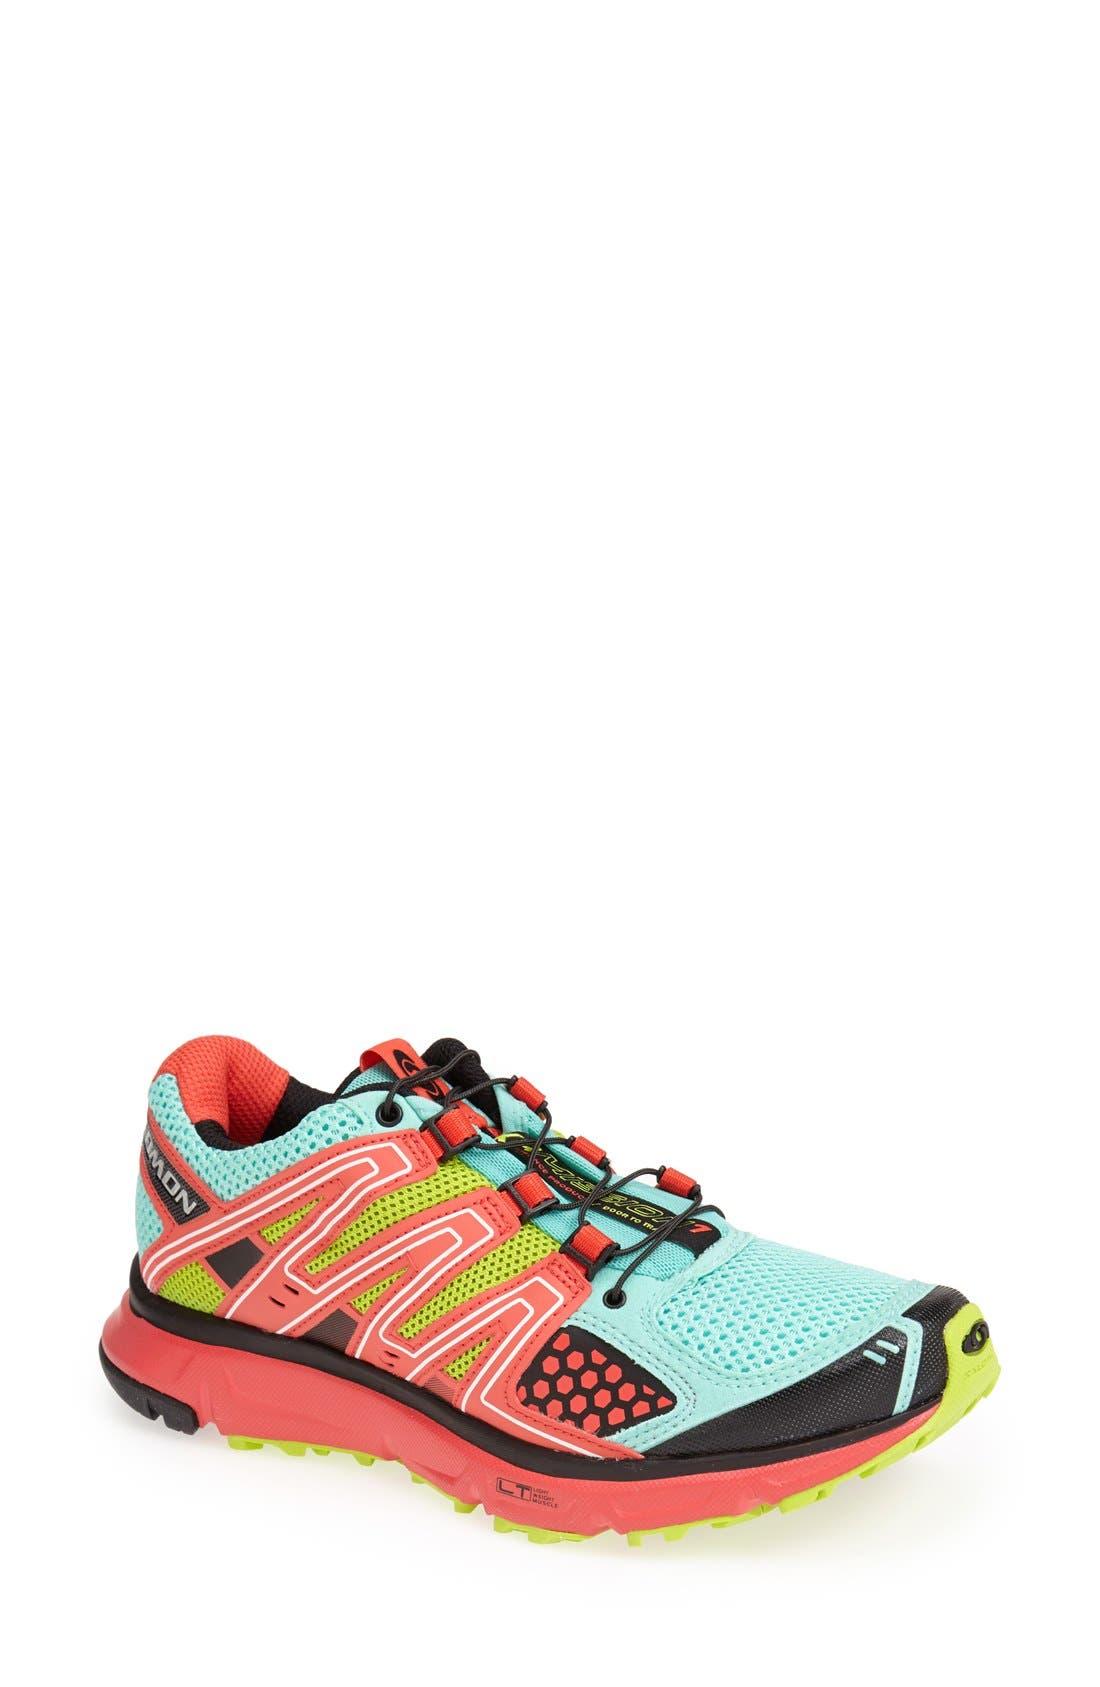 Main Image - Salomon 'XR Mission' Trail Running Shoe (Women)